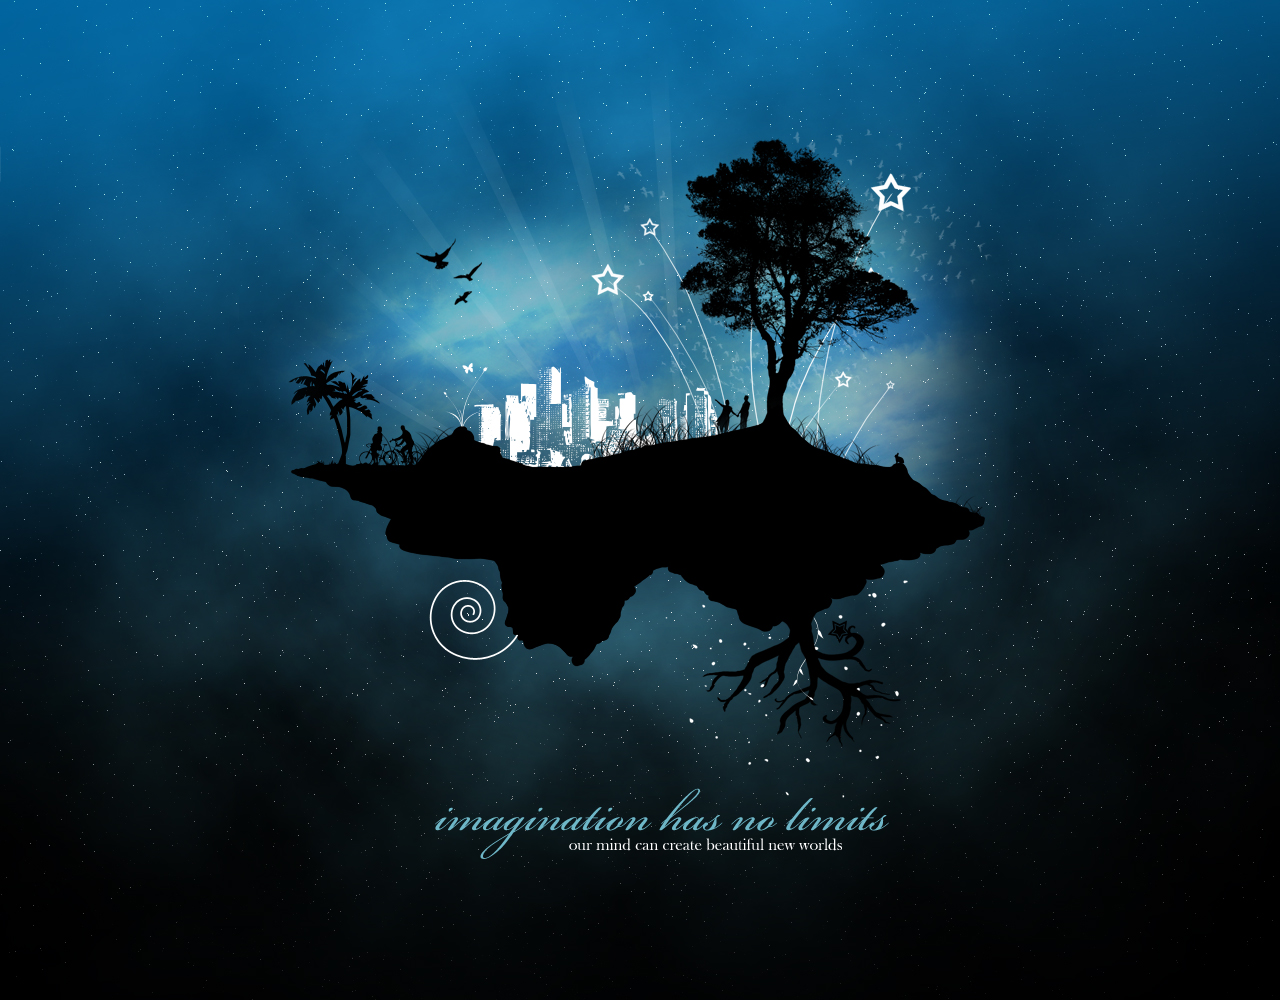 imagination... by punktlos